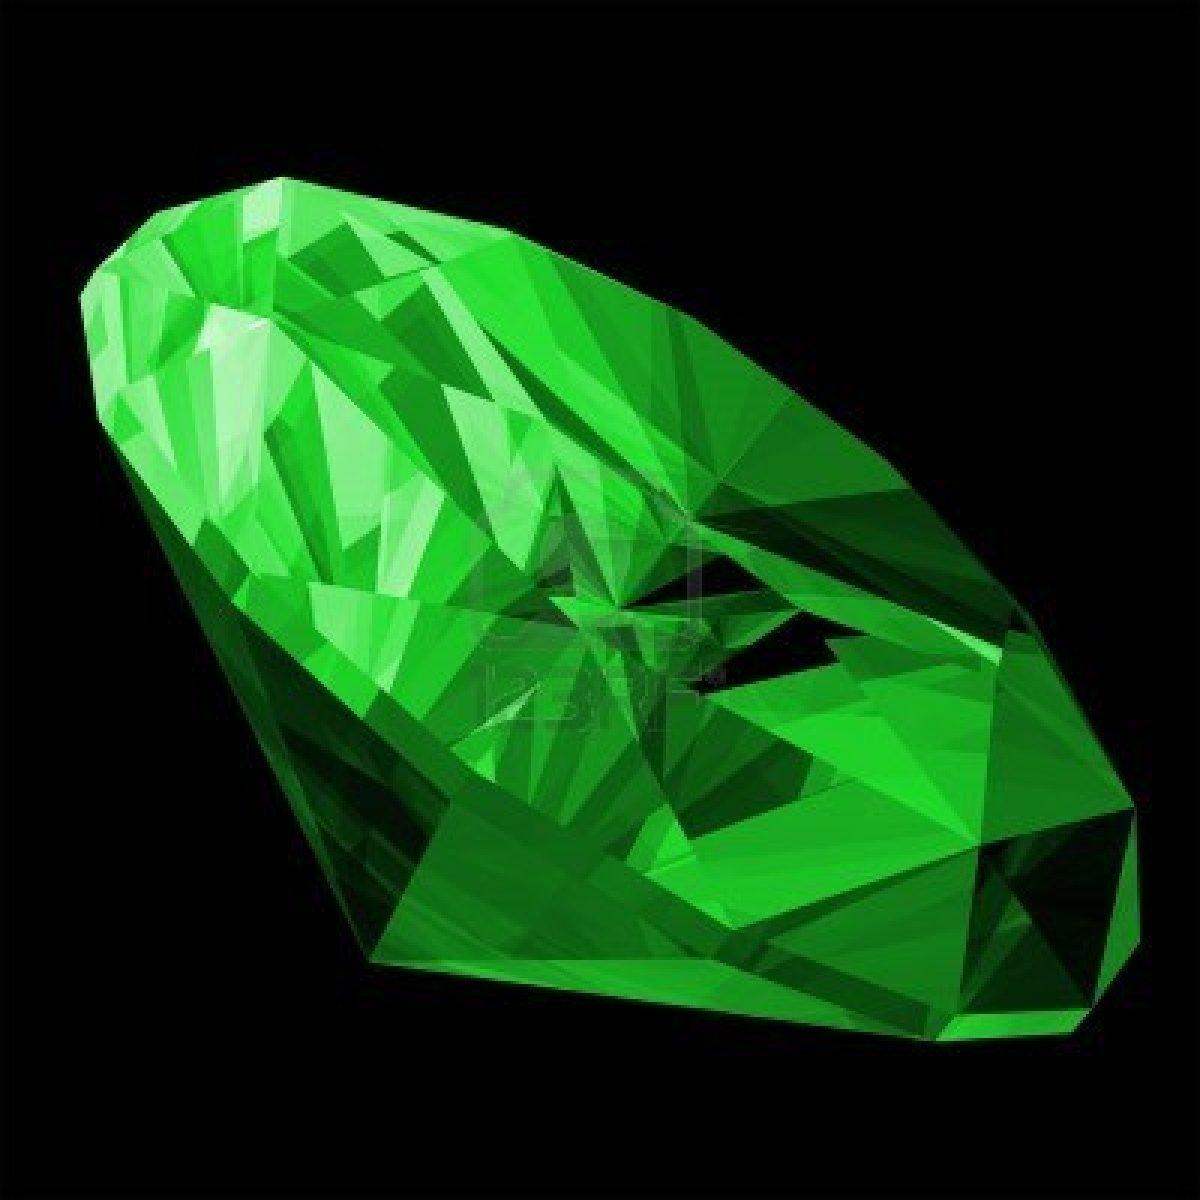 Emerald-01.jpg?width=189